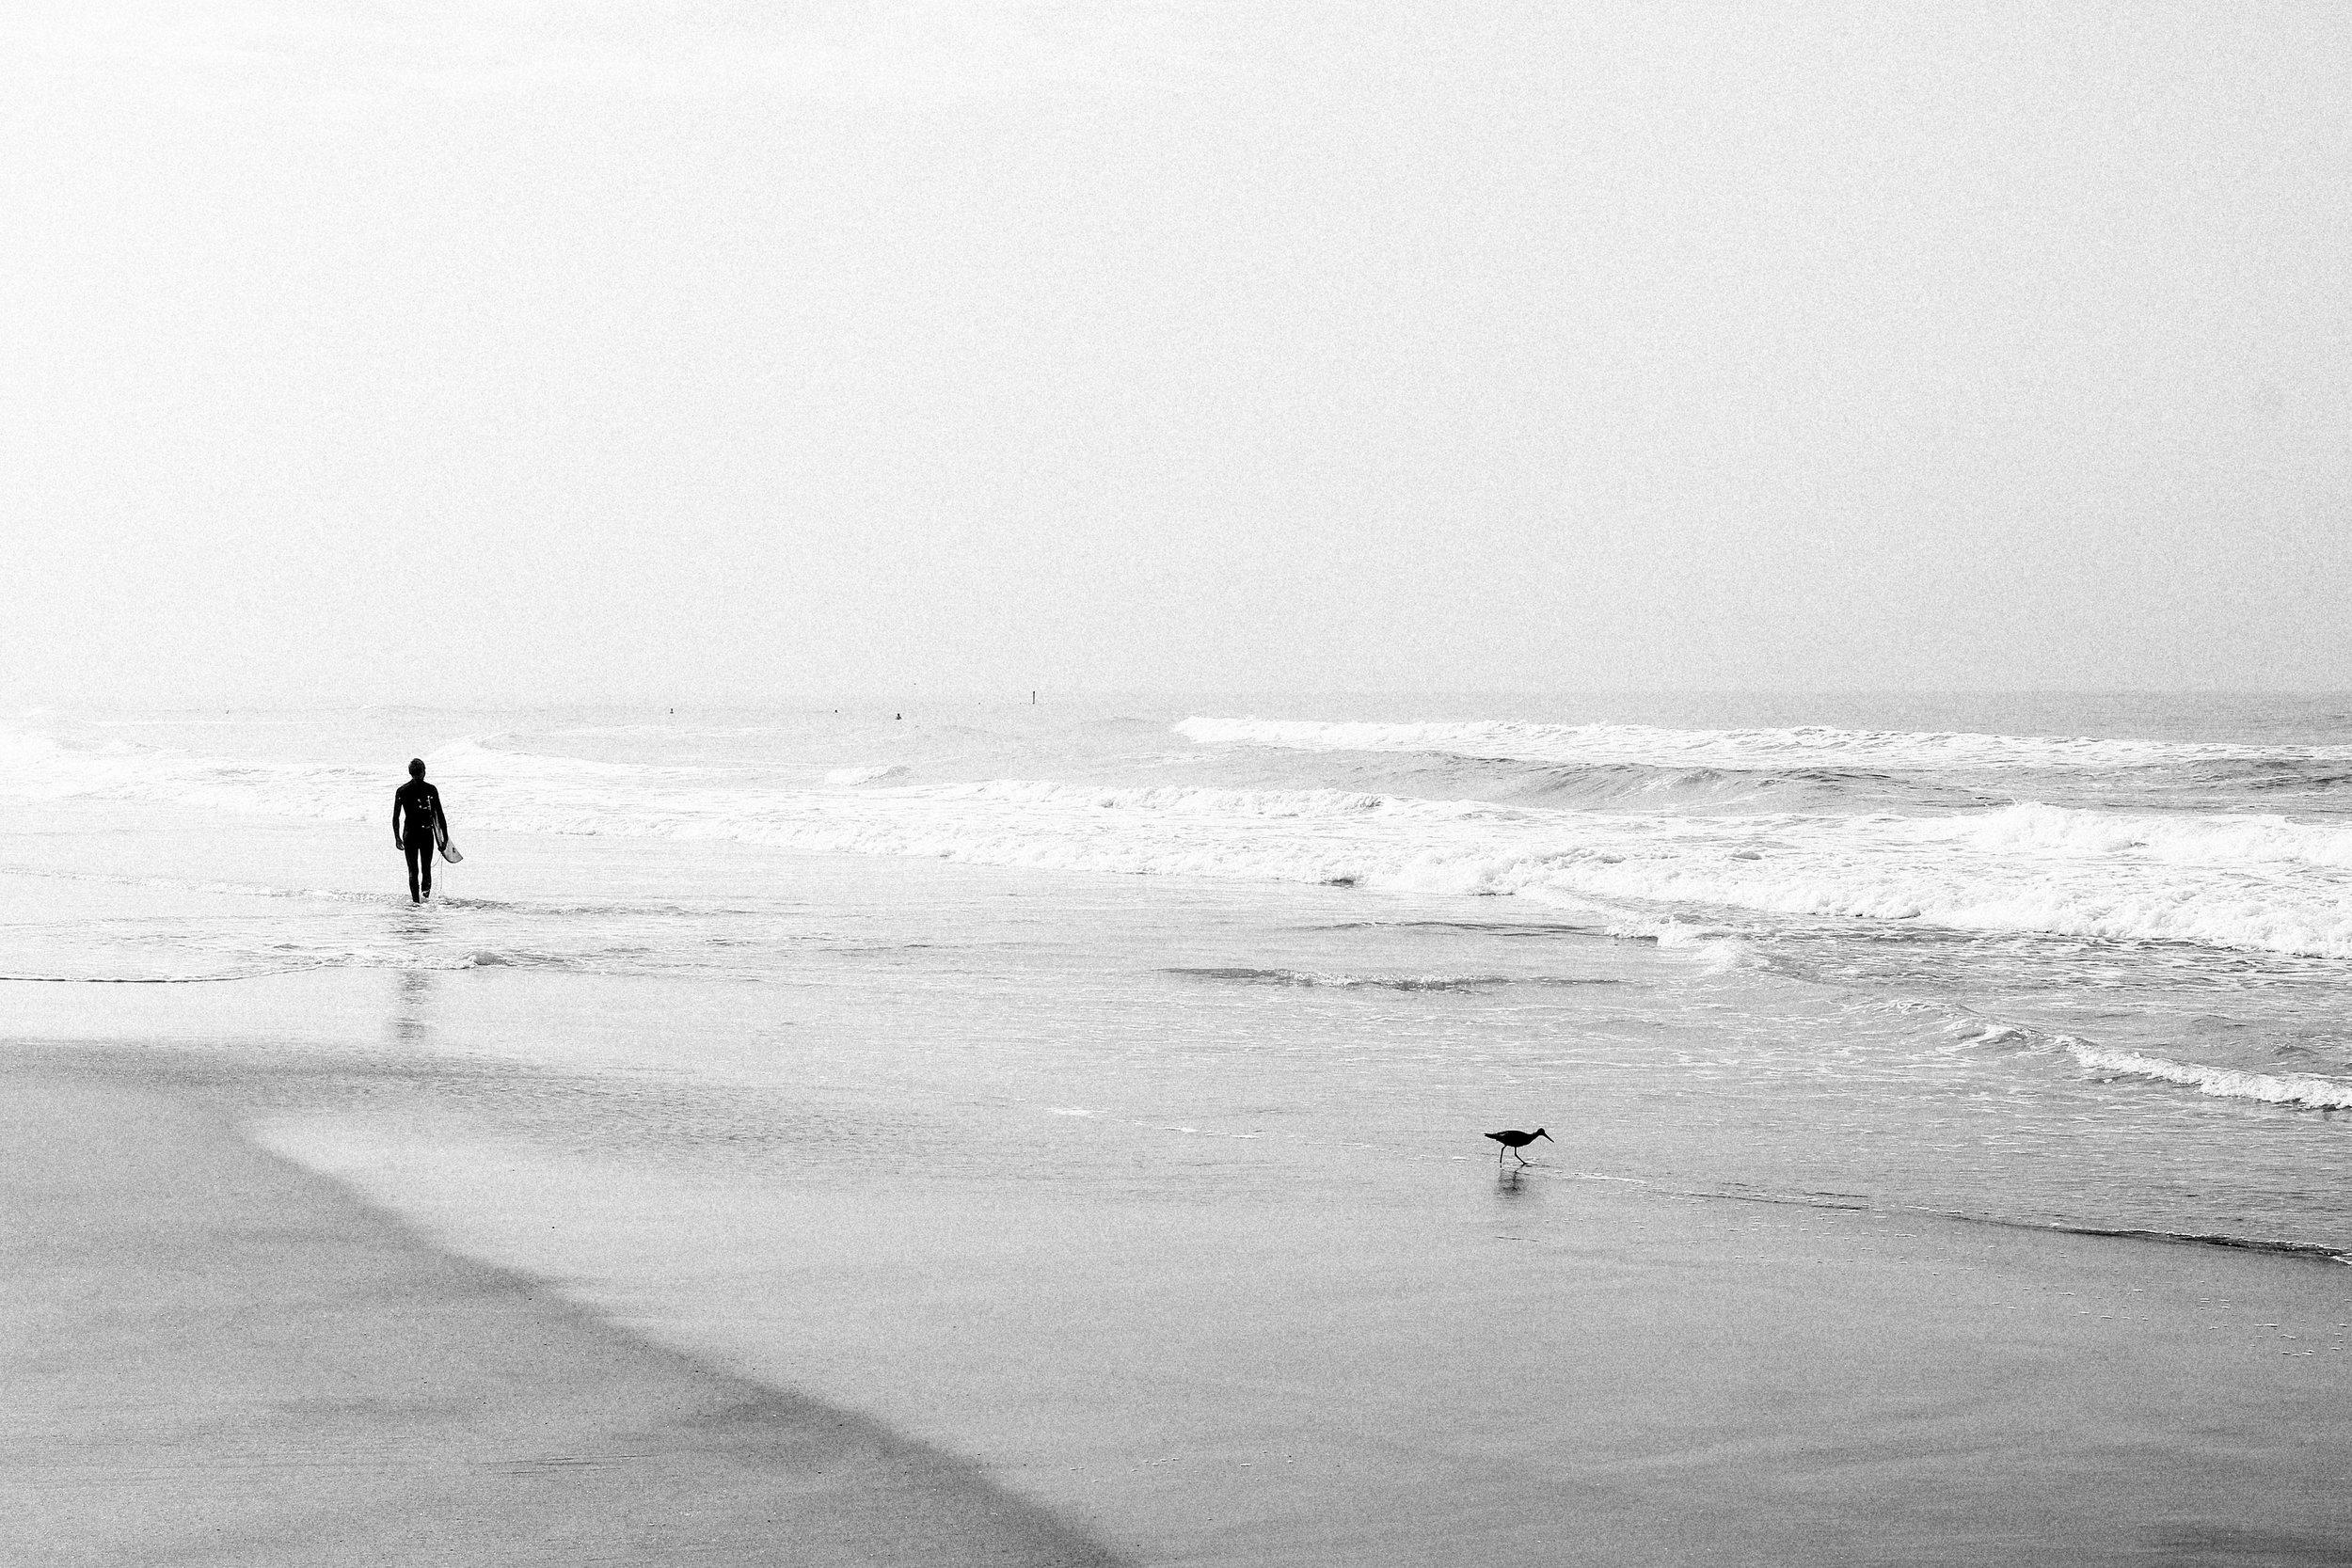 HUNTINGTON BEACH, CALIFORNIA PHOTOGRAPHY - TAYLORKRISTIINA.COM